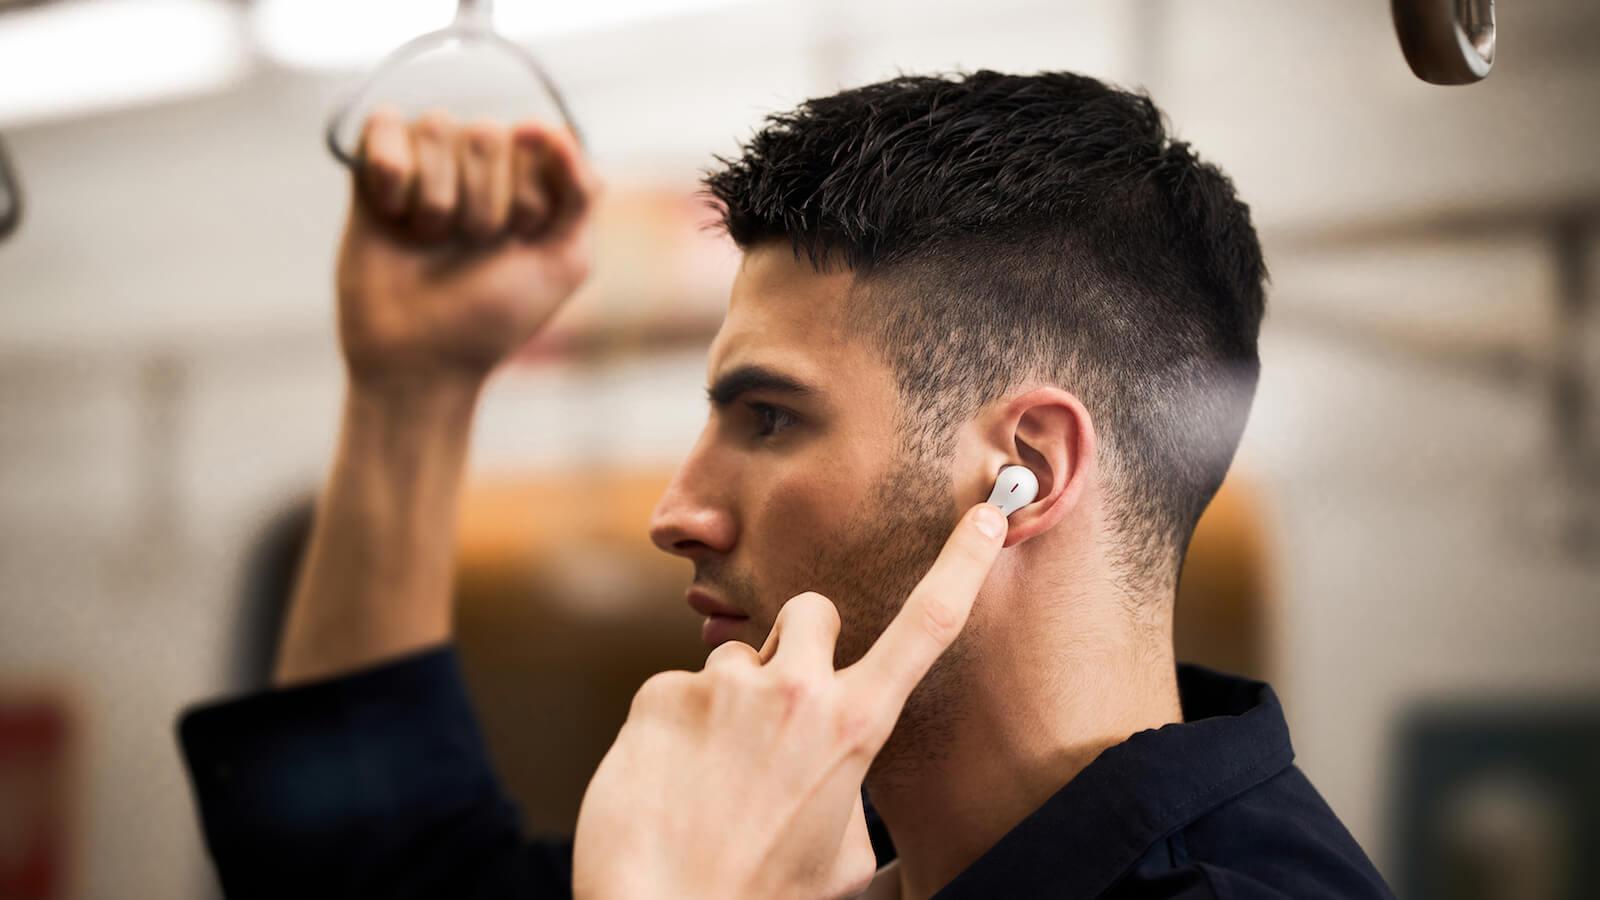 https://thegadgetflow.com/wp-content/uploads/2021/03/1MORE-ComfoBuds-Pro-wireless-ergonomic-headphones-01-1200x675.jpg